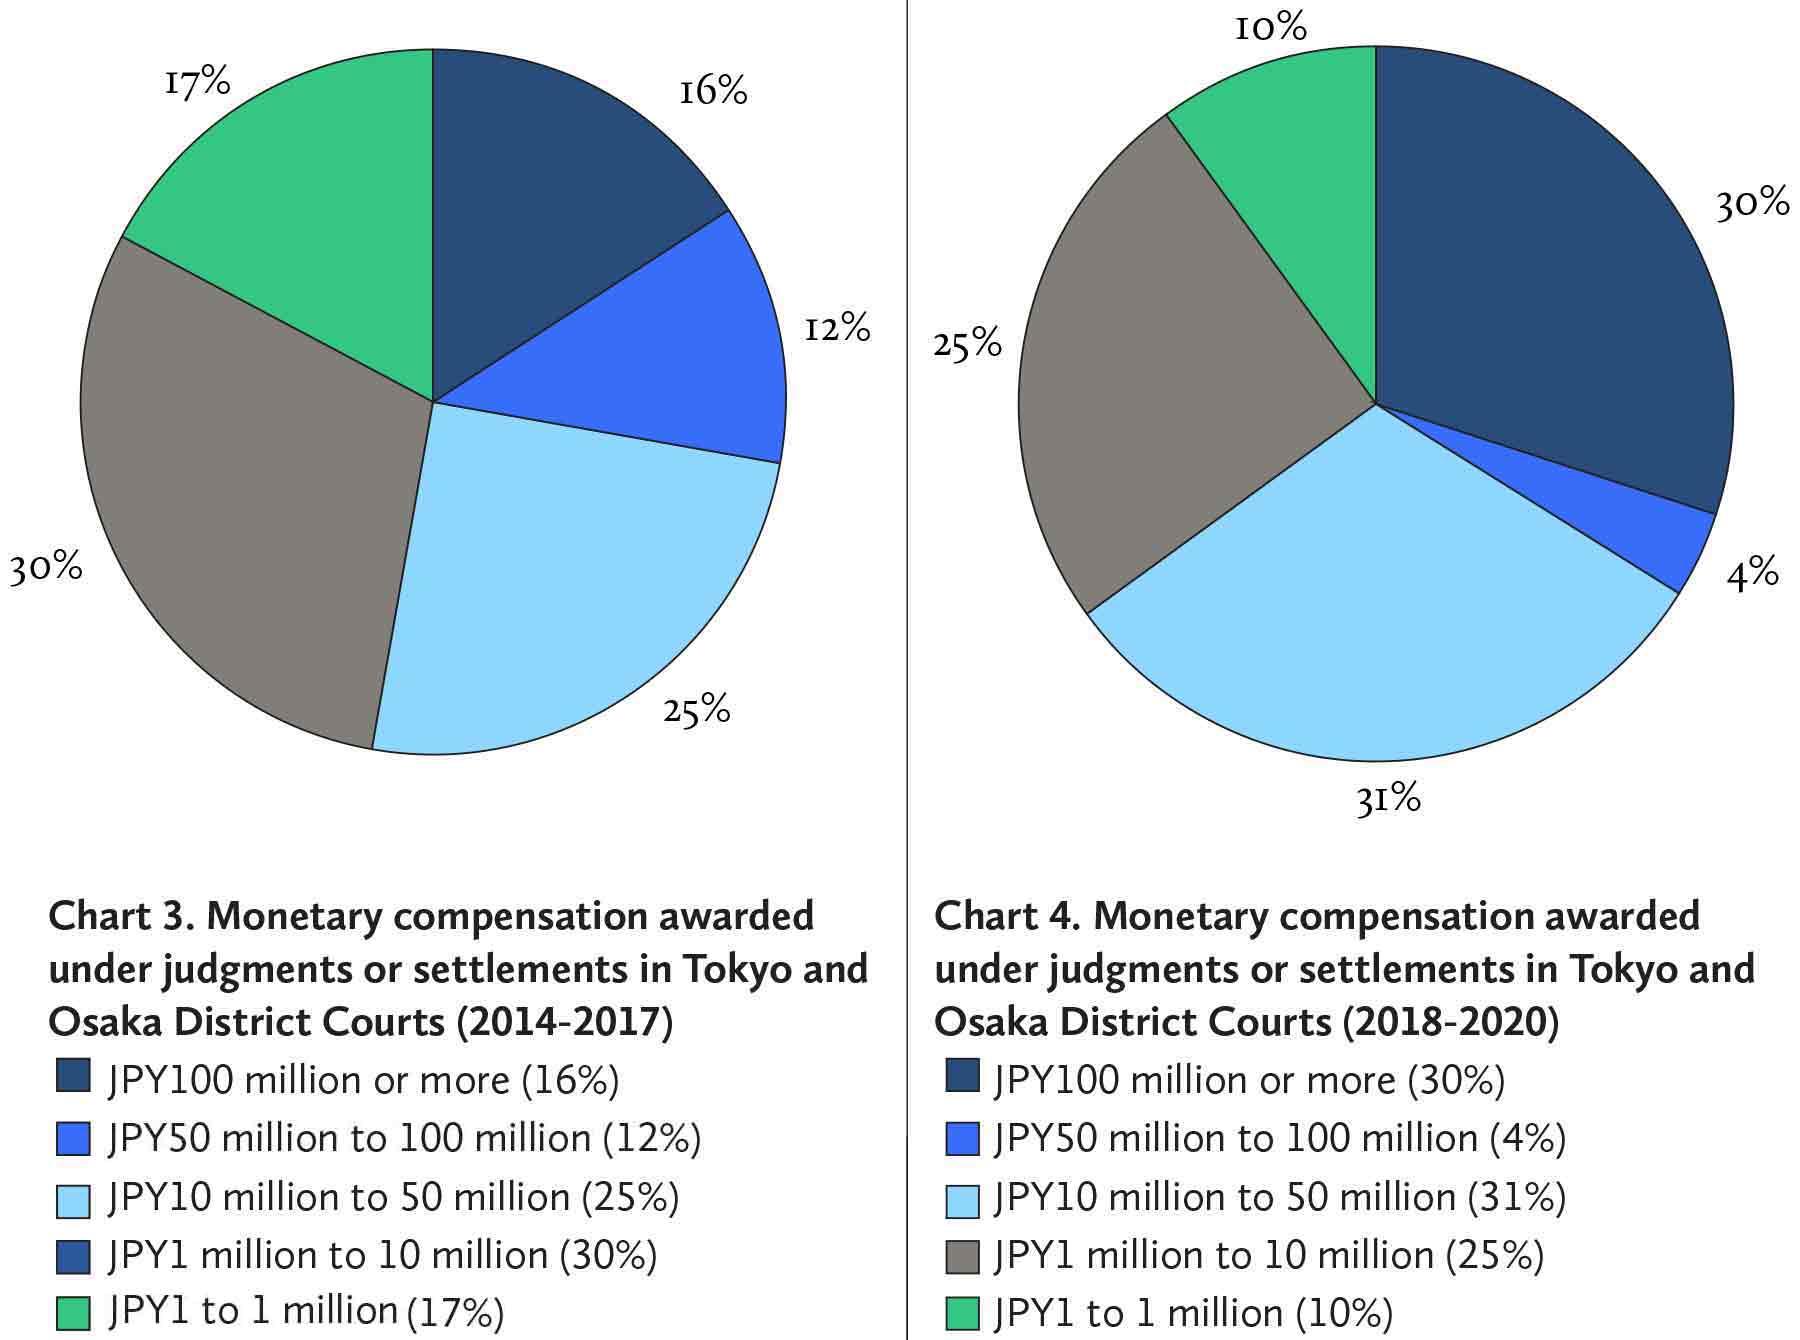 A-COMPARISON-OF-DEVELOPMENT-DEVELOPMENT-OF-PATENT-LAW- 各国 ANE 法 发展 对比 -Chart-3-4-Fr